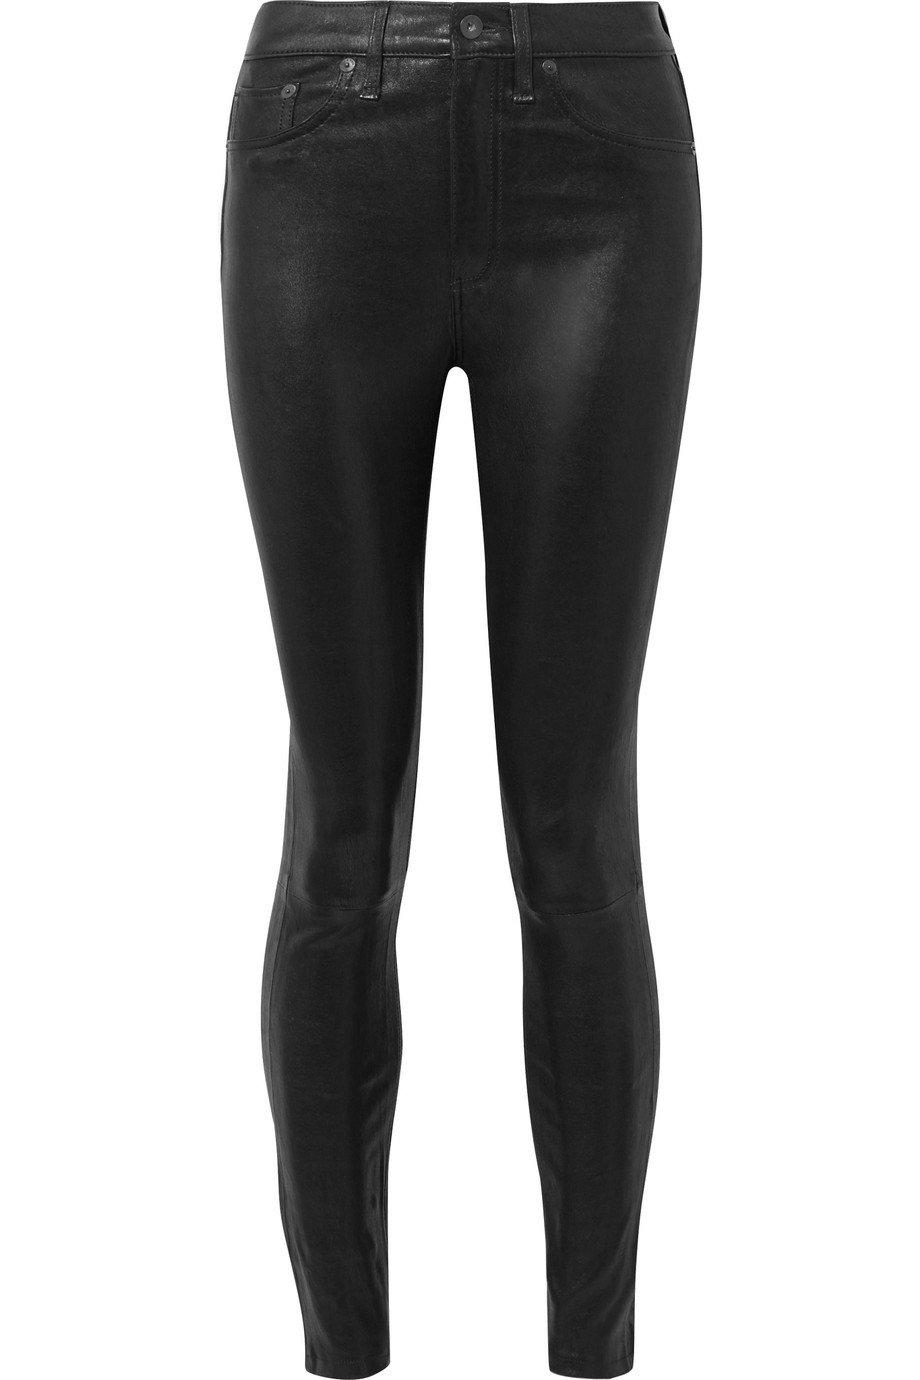 rag & bone | Leather high-rise skinny pants | NET-A-PORTER.COM